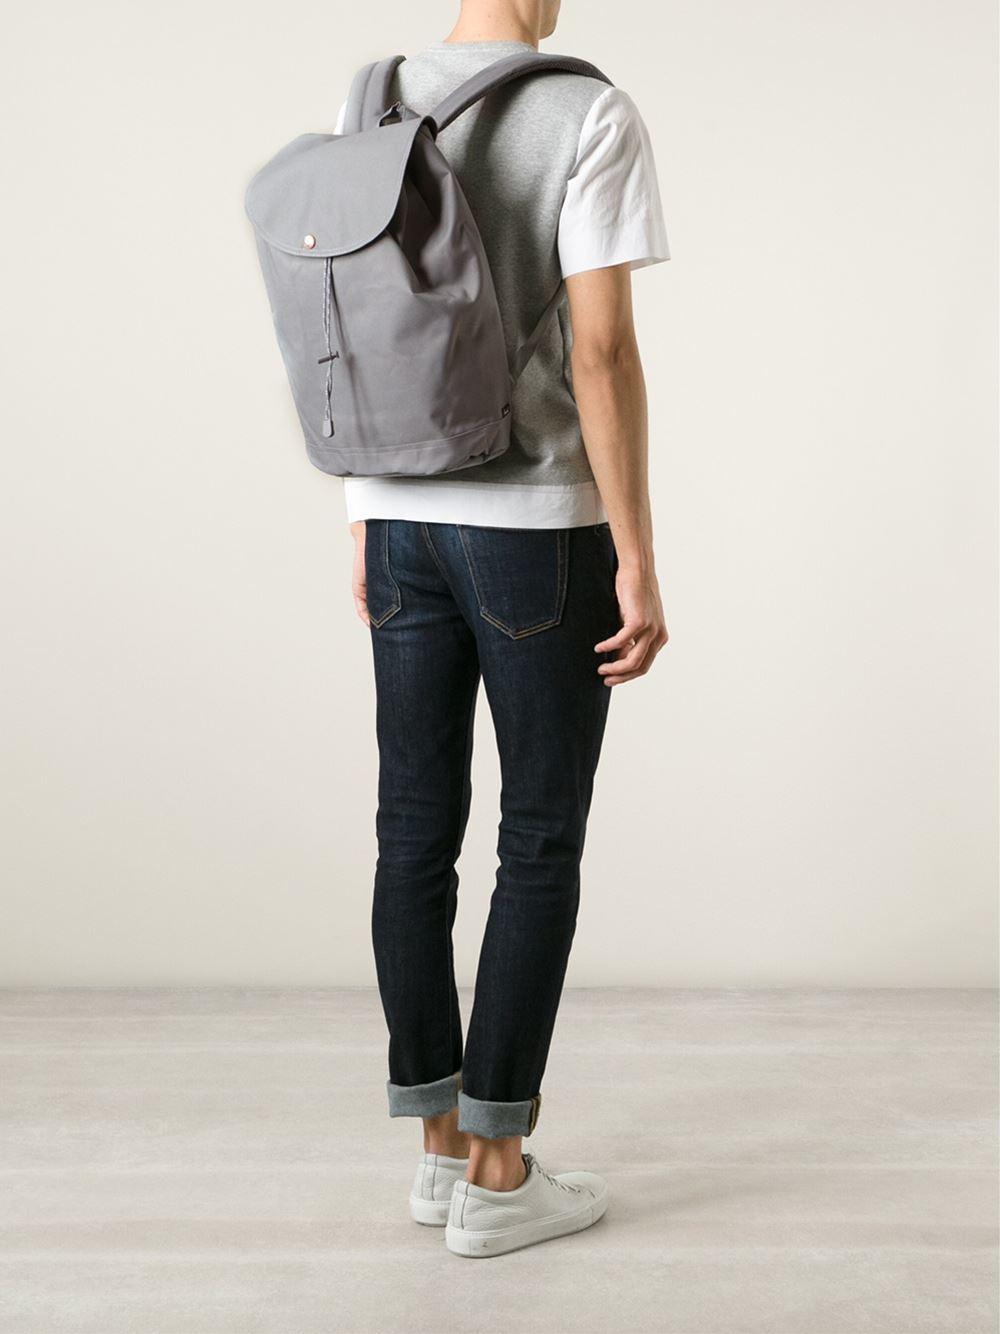 Oakley Icon 3.0 Backpack Amazon | Louisiana Bucket Brigade